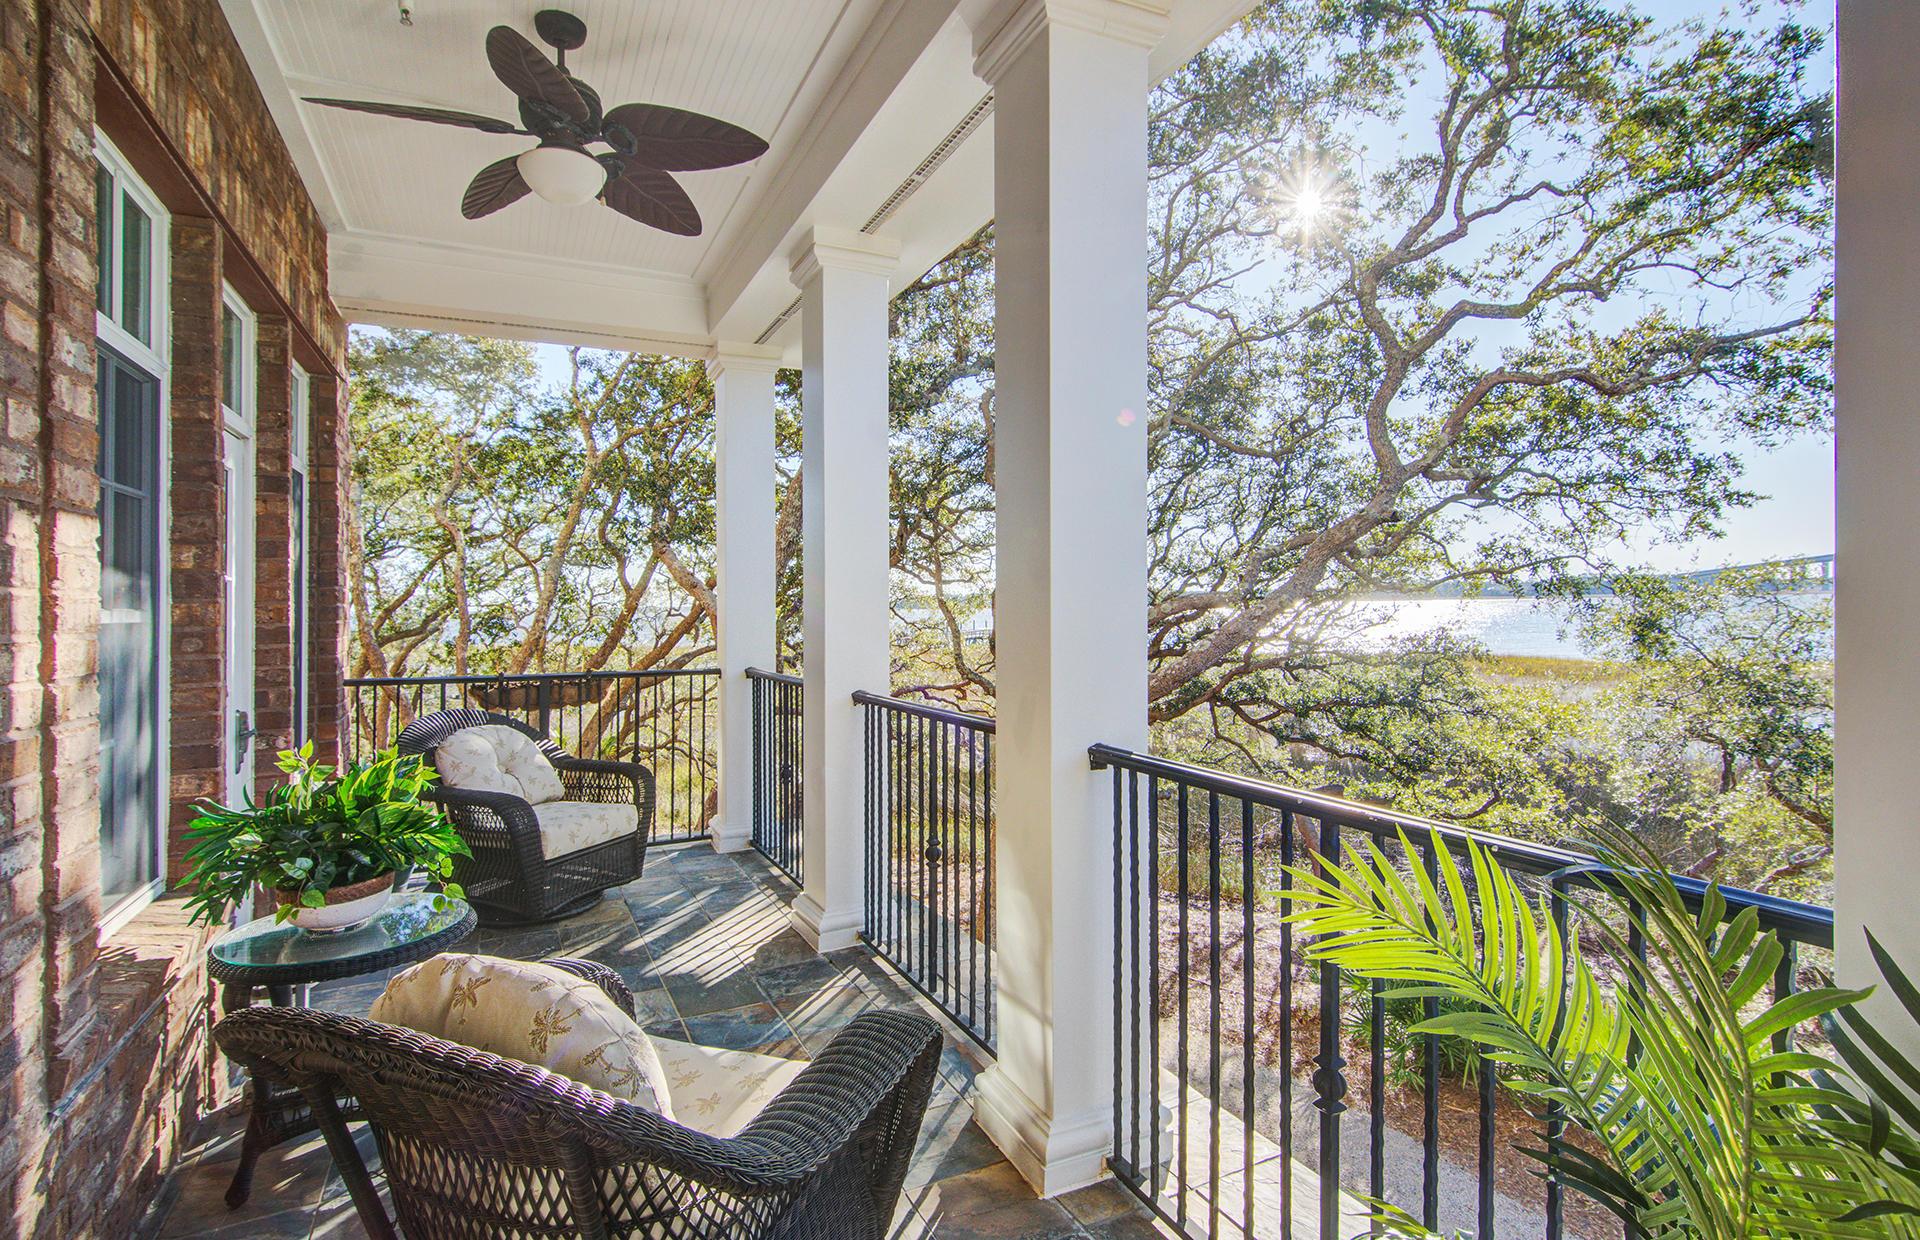 Daniel Island Homes For Sale - 134 Fairbanks Oak, Charleston, SC - 26